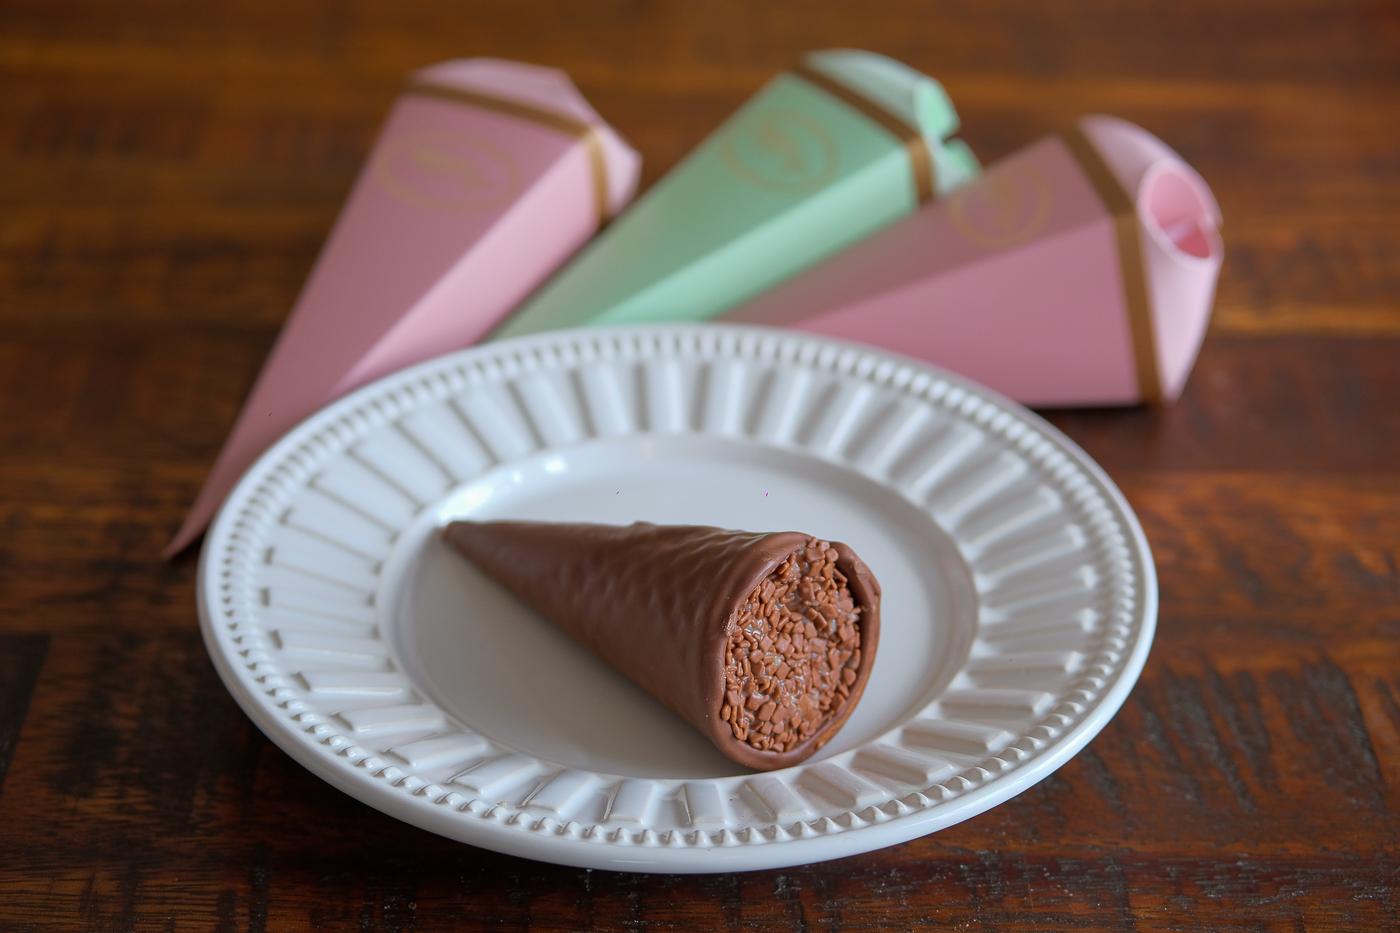 Cone de Chocolate